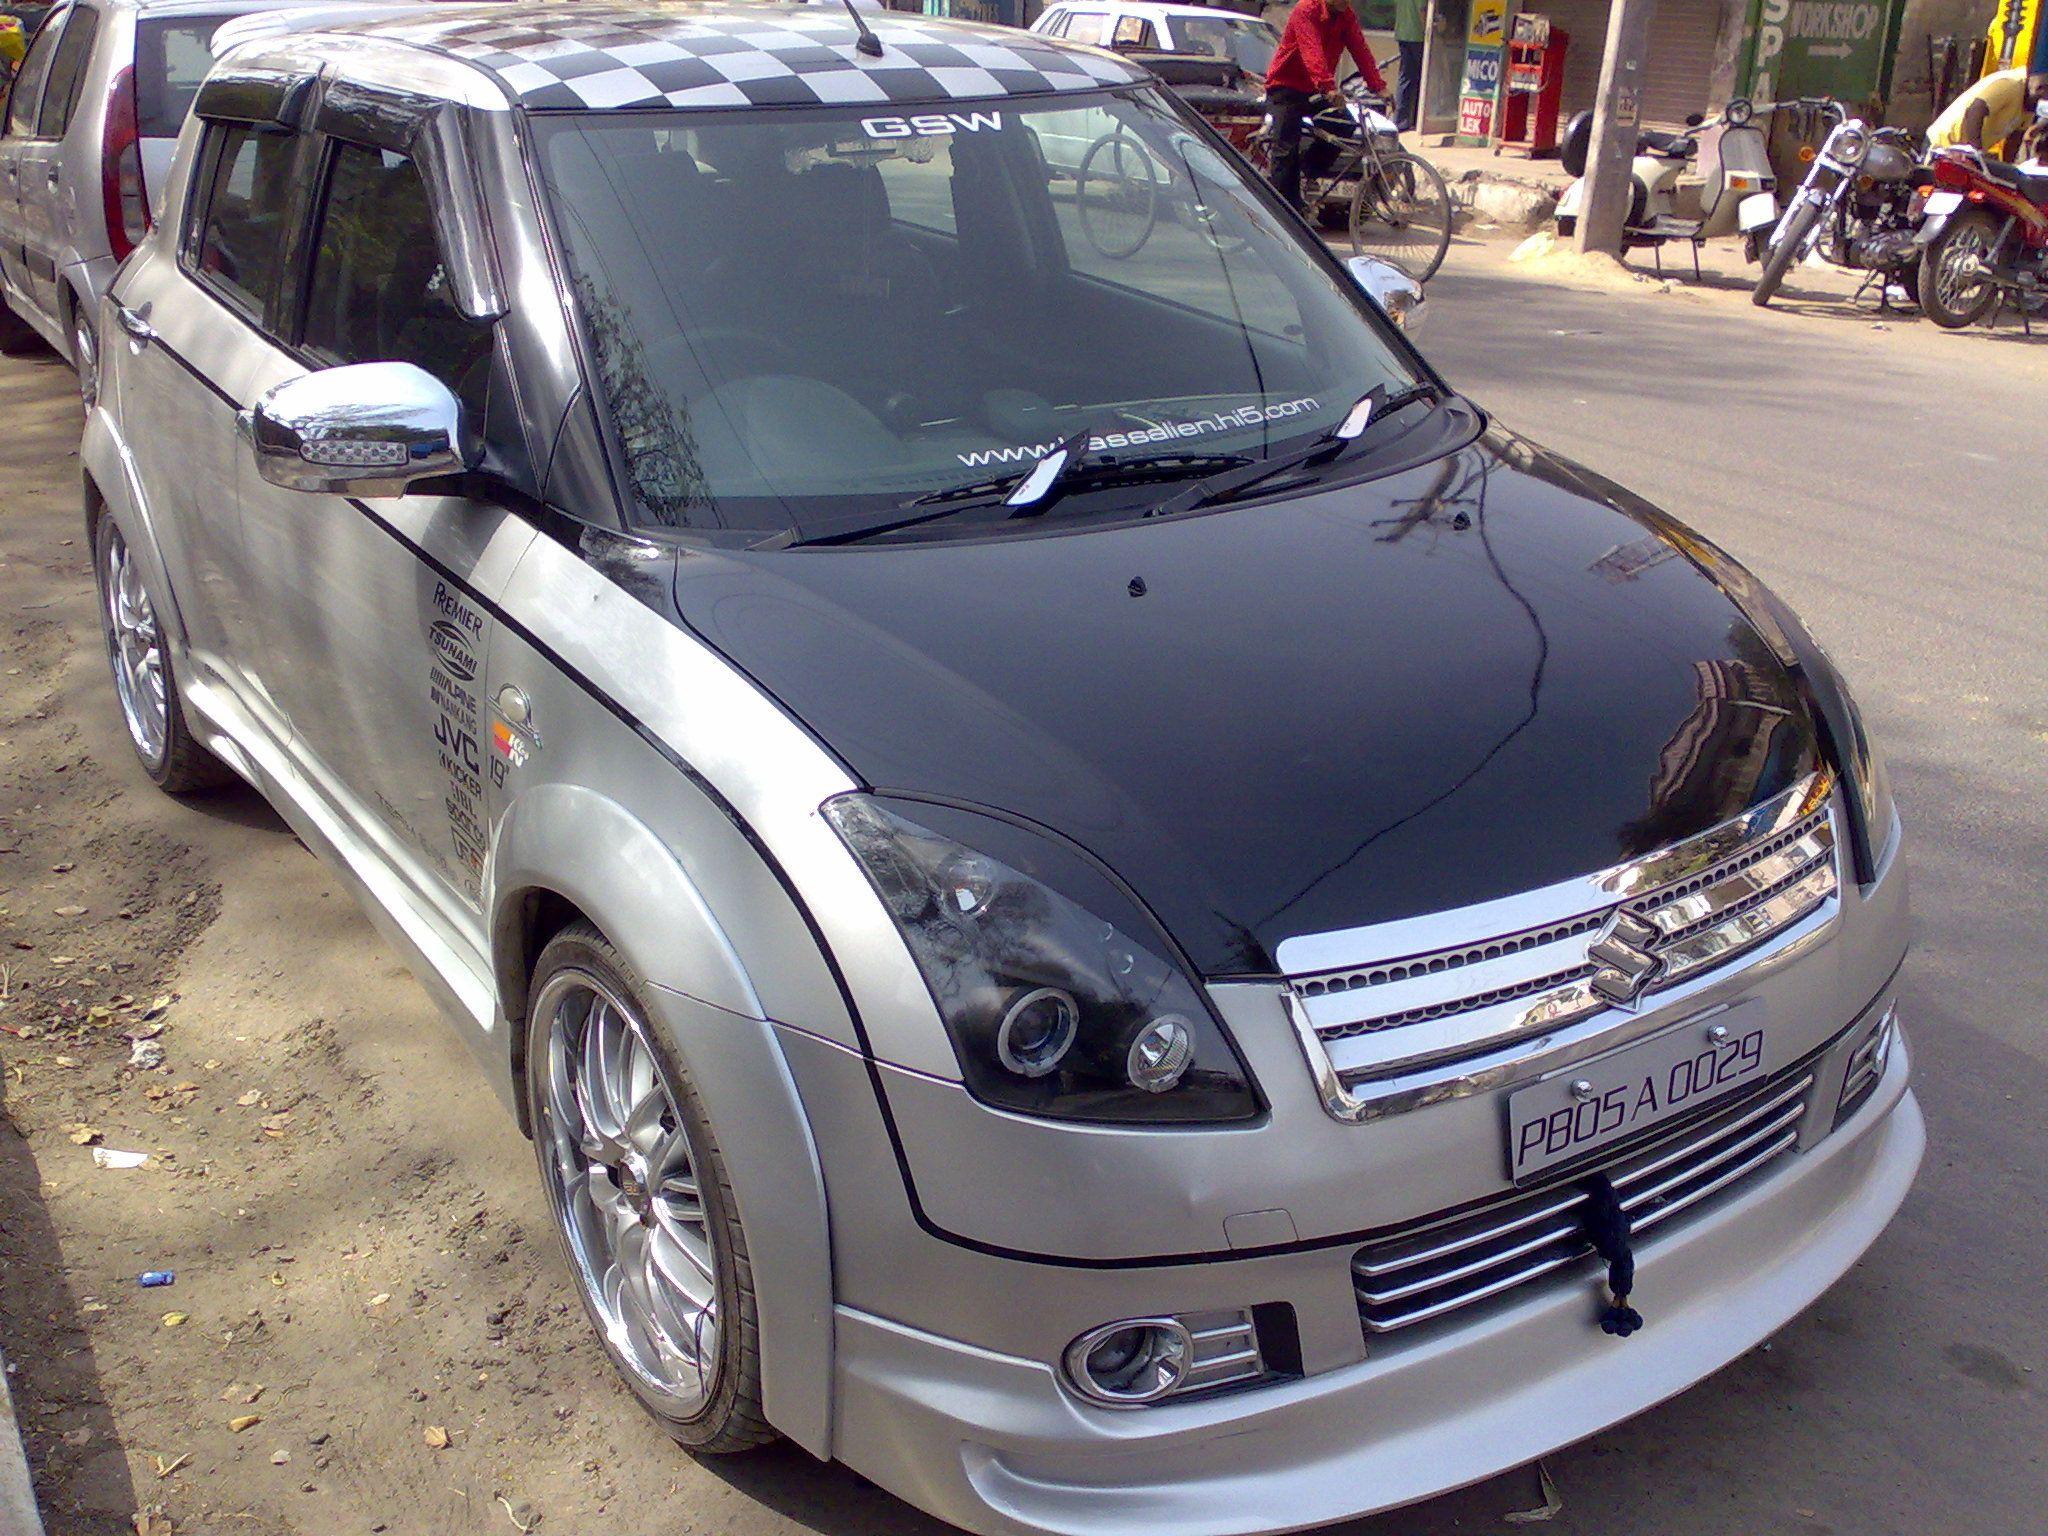 Sports Cars For Sale >> Car Sale Jalandhar Fresh Car Modification Jalandhar New